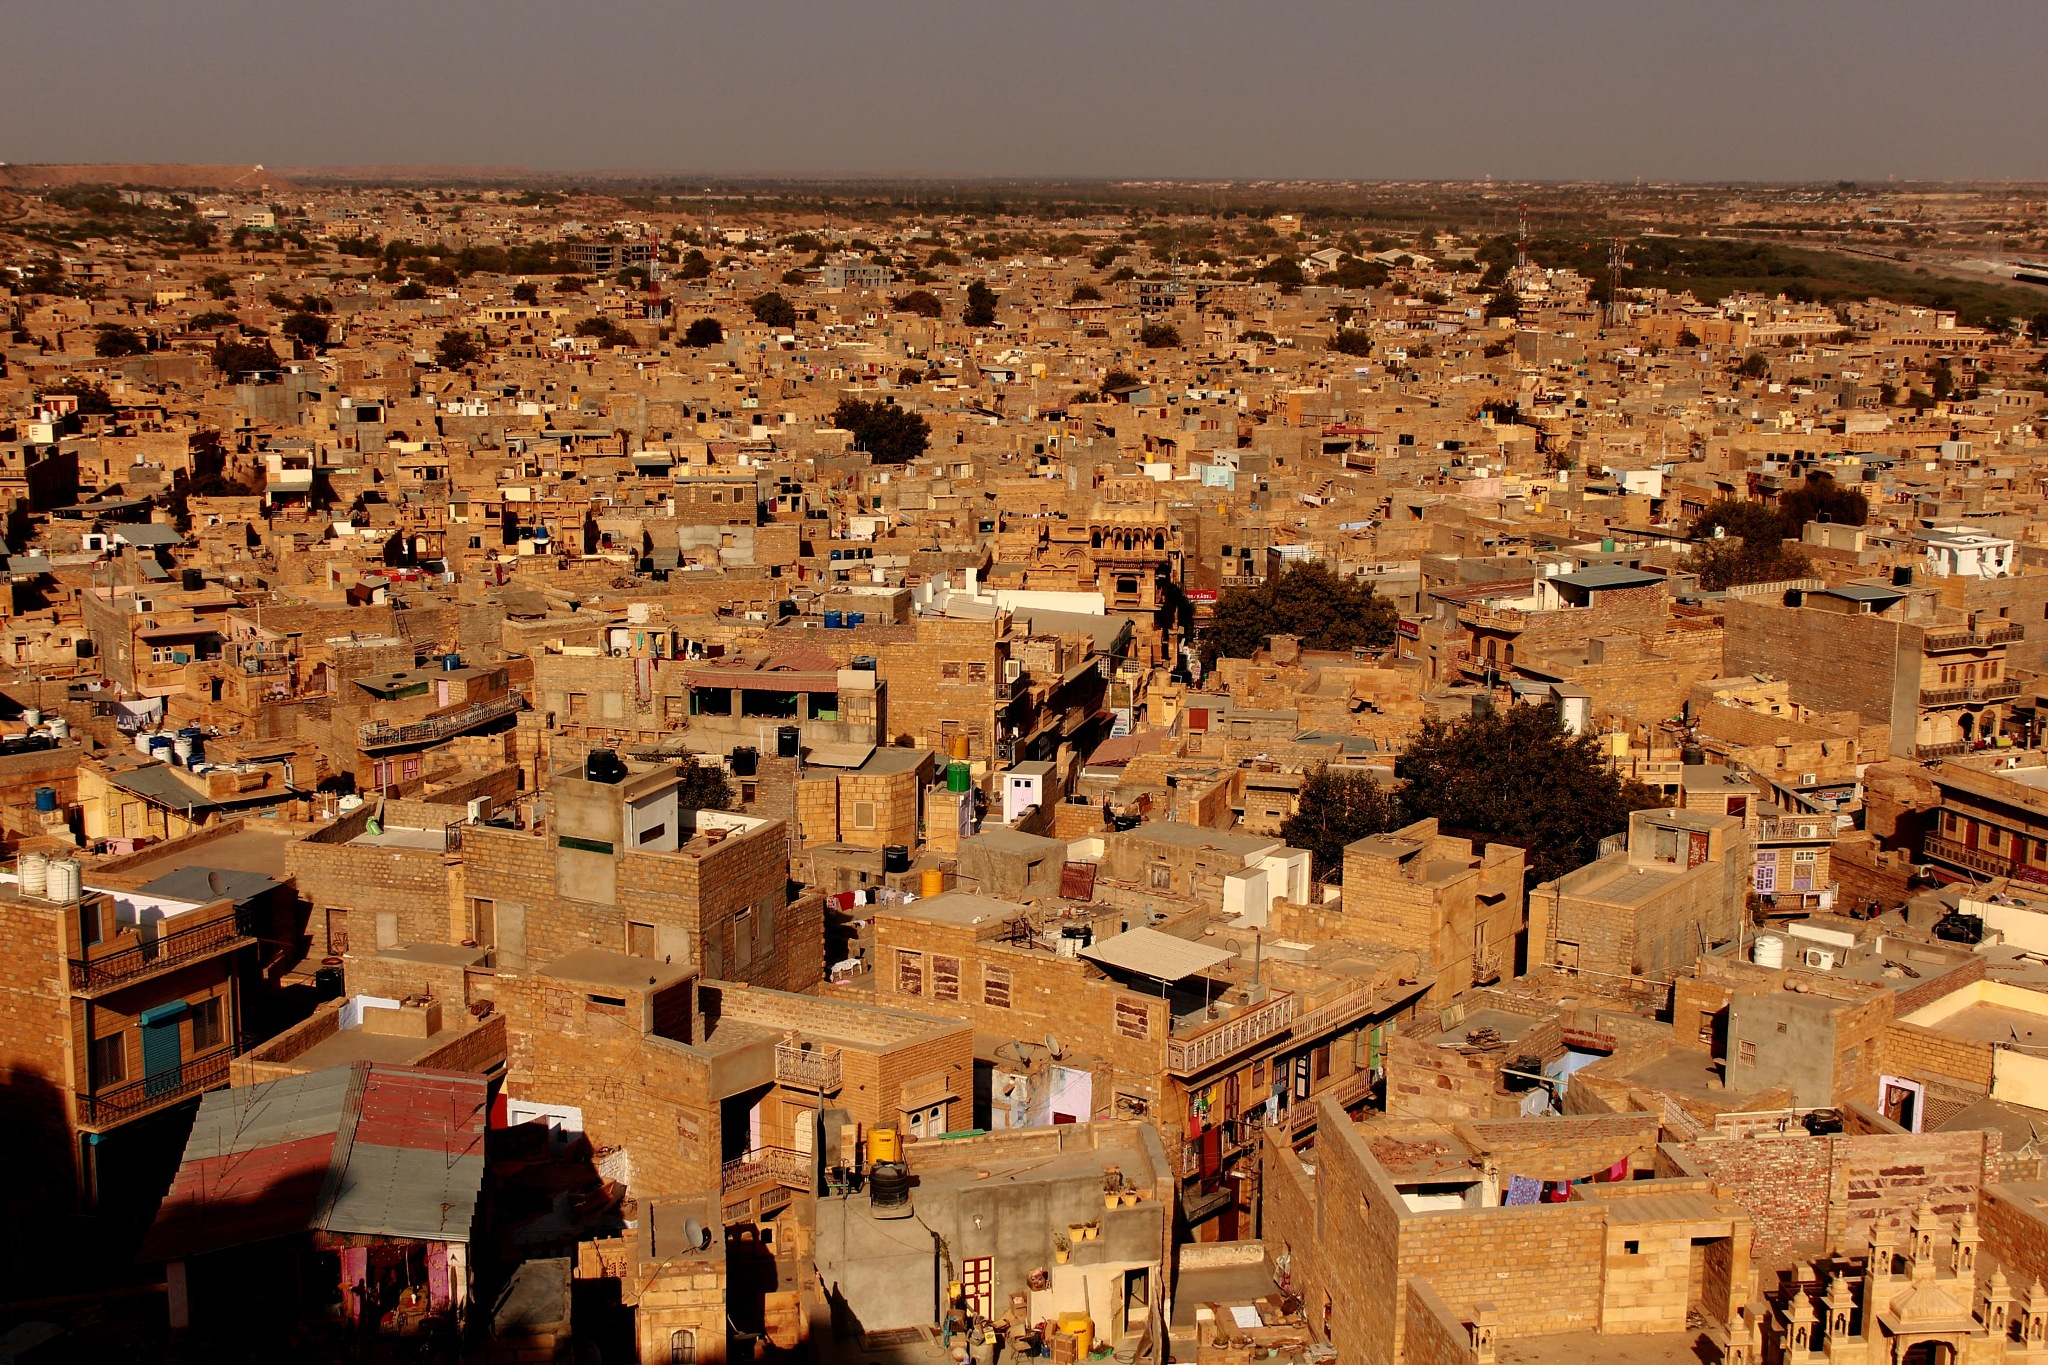 The Golden City by Rafiqul Islam Tushar